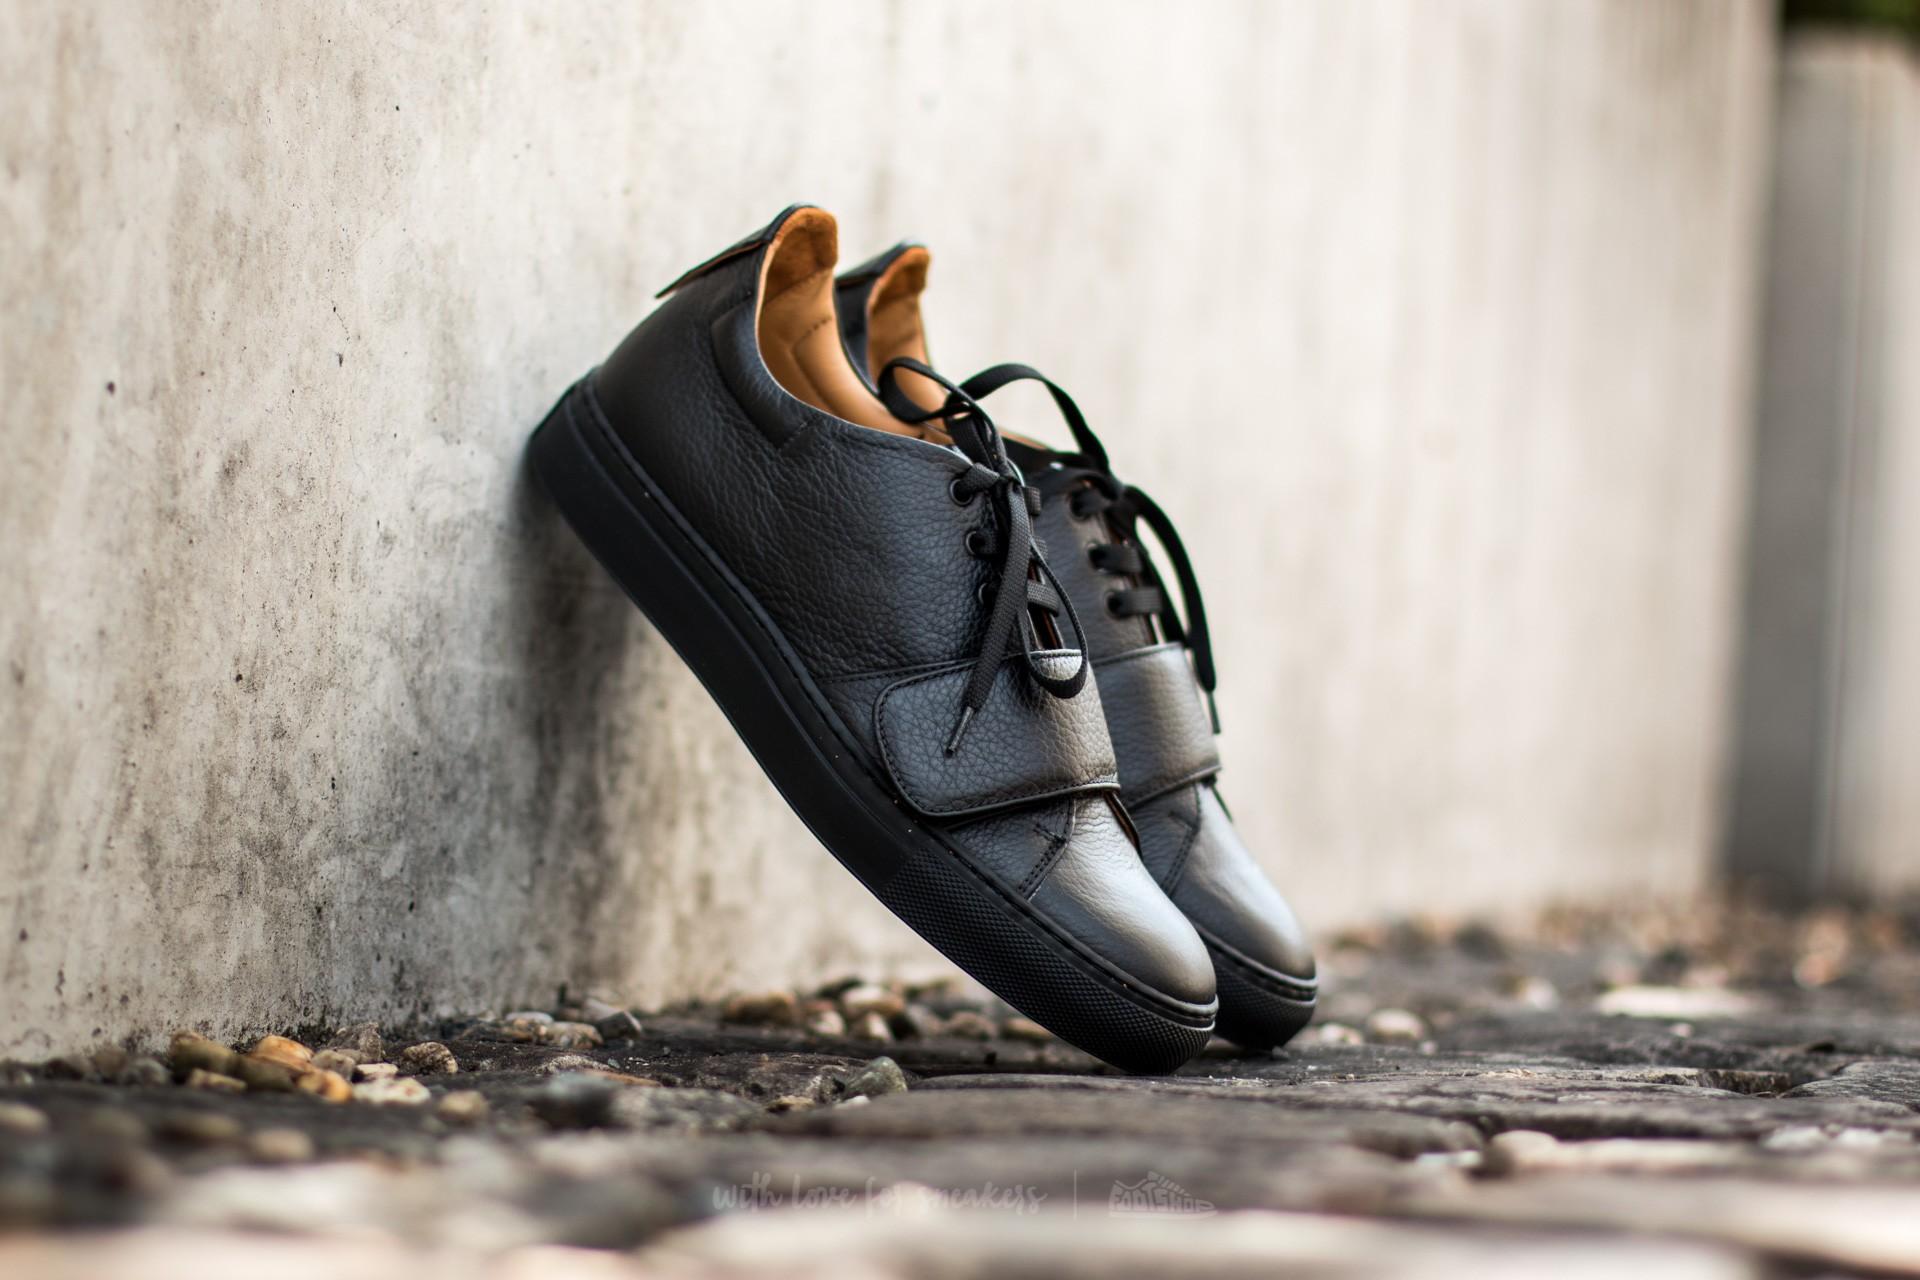 Marco Laganà Sneaker Strap Black Leather - Black Sole - 10099